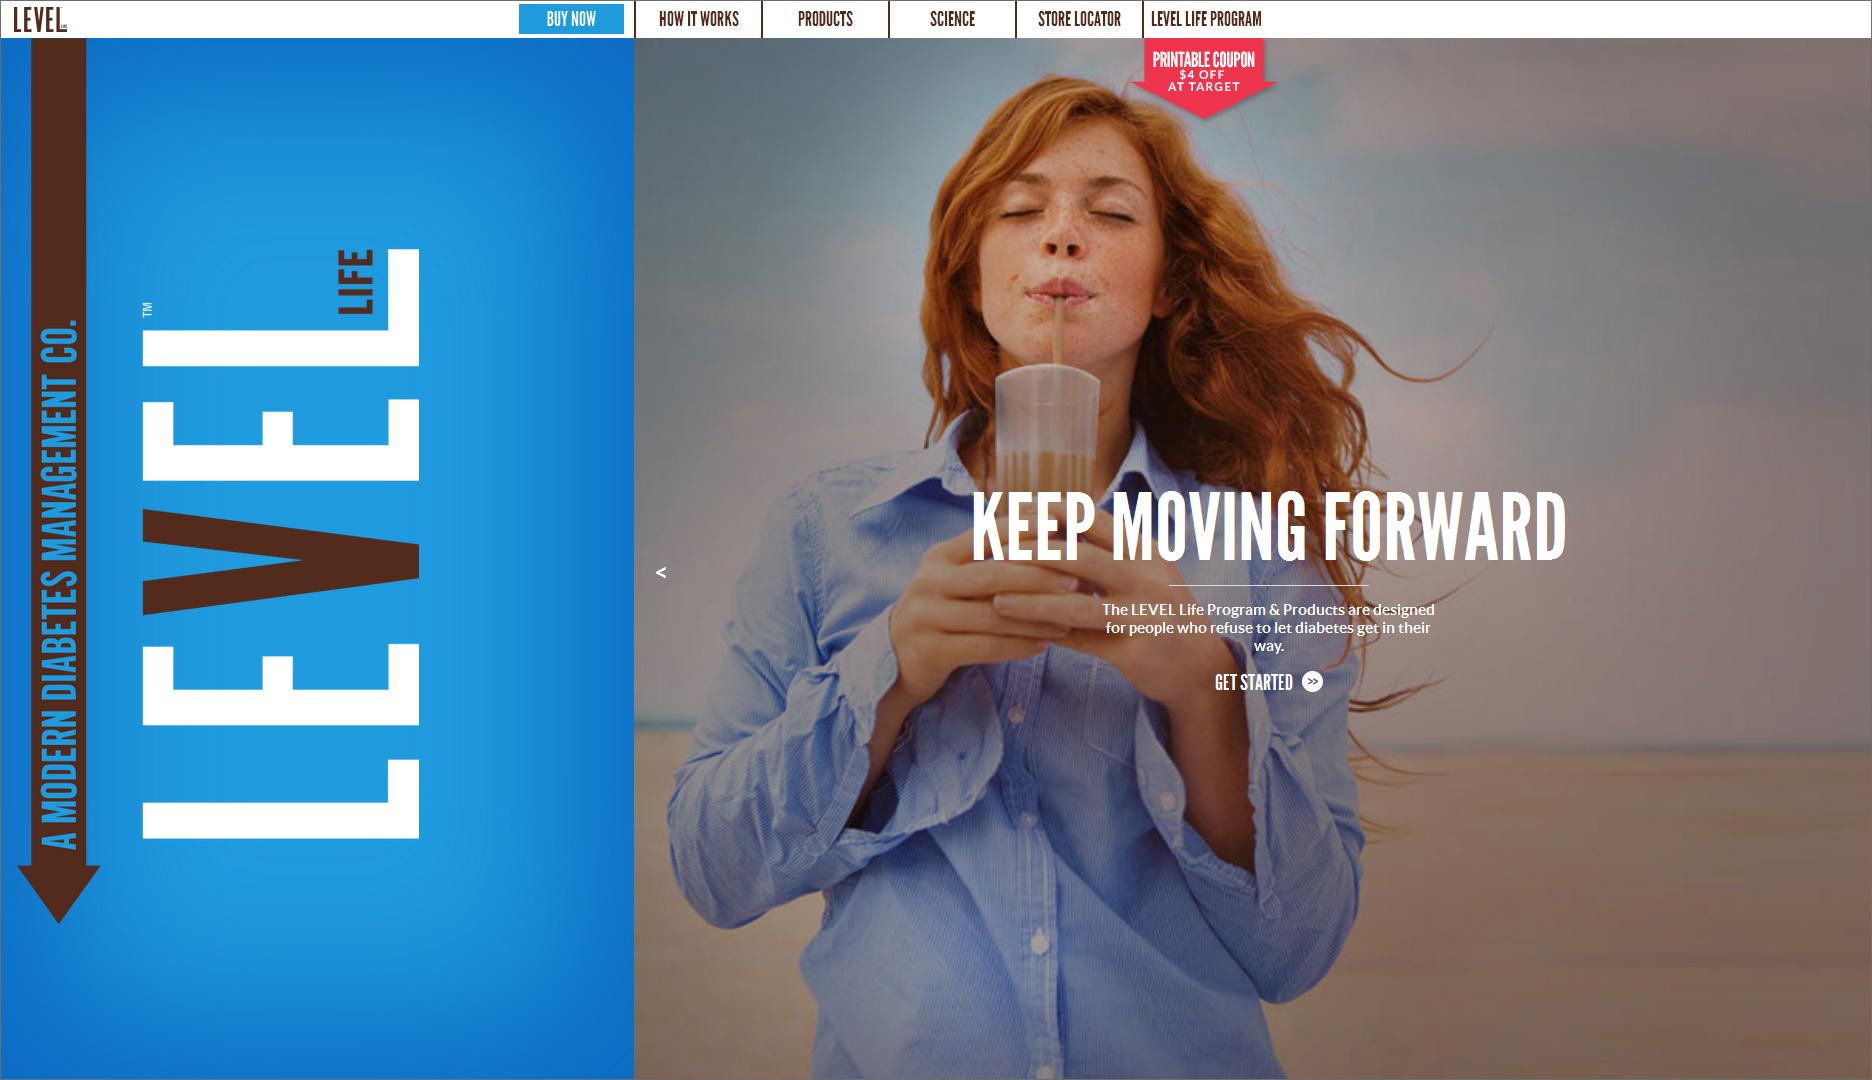 Subtle sexual cues in web design, innuendo